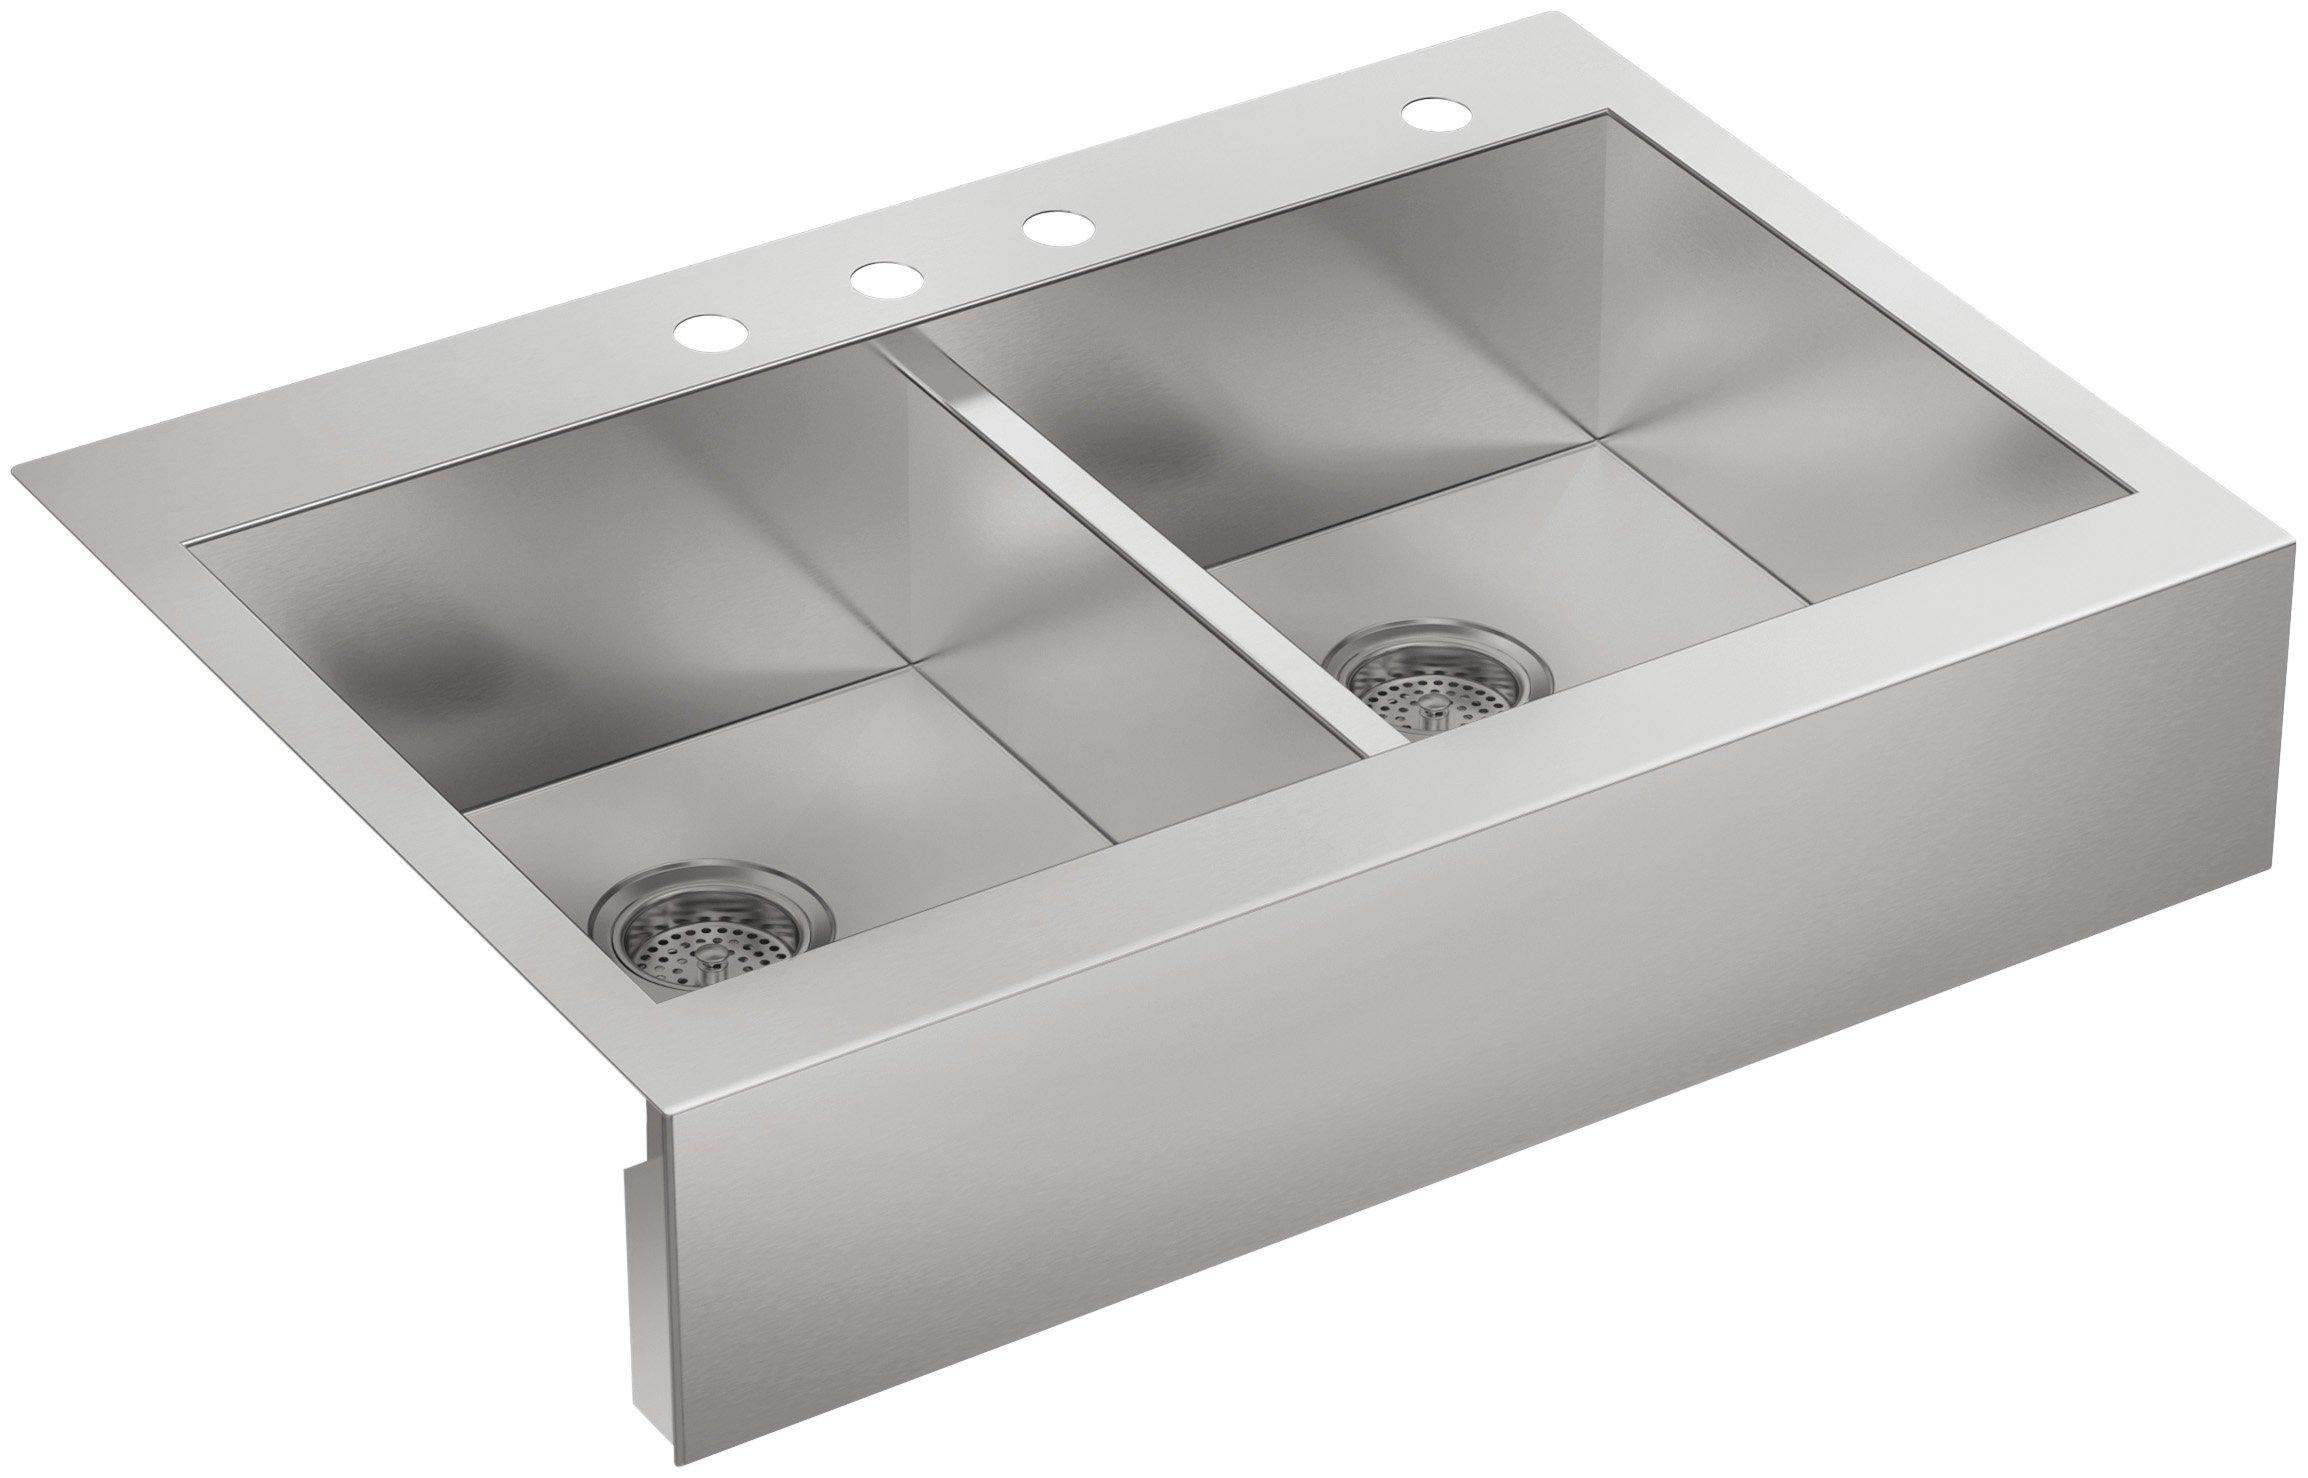 KOHLER Vault Double Bowl 18-Gauge Stainless Steel Apron Front Four Faucet Hole Kitchen Sink, Top-mount Drop-in Installation K-3944-4-NA